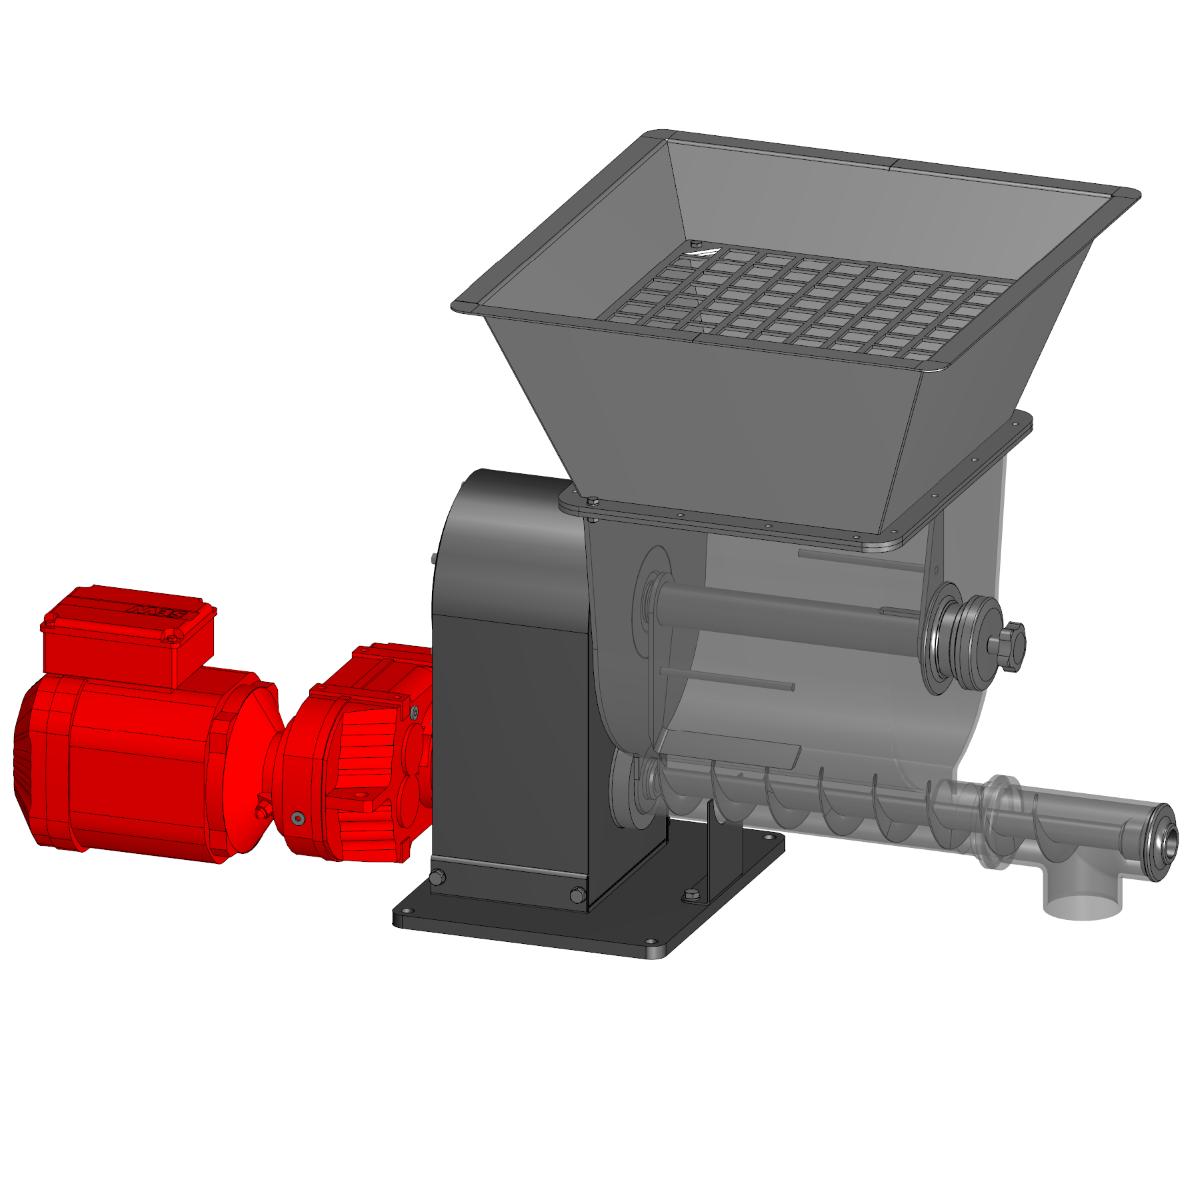 auger conveyors inc lg manufacturer conveyor product feeder screw jorgensen